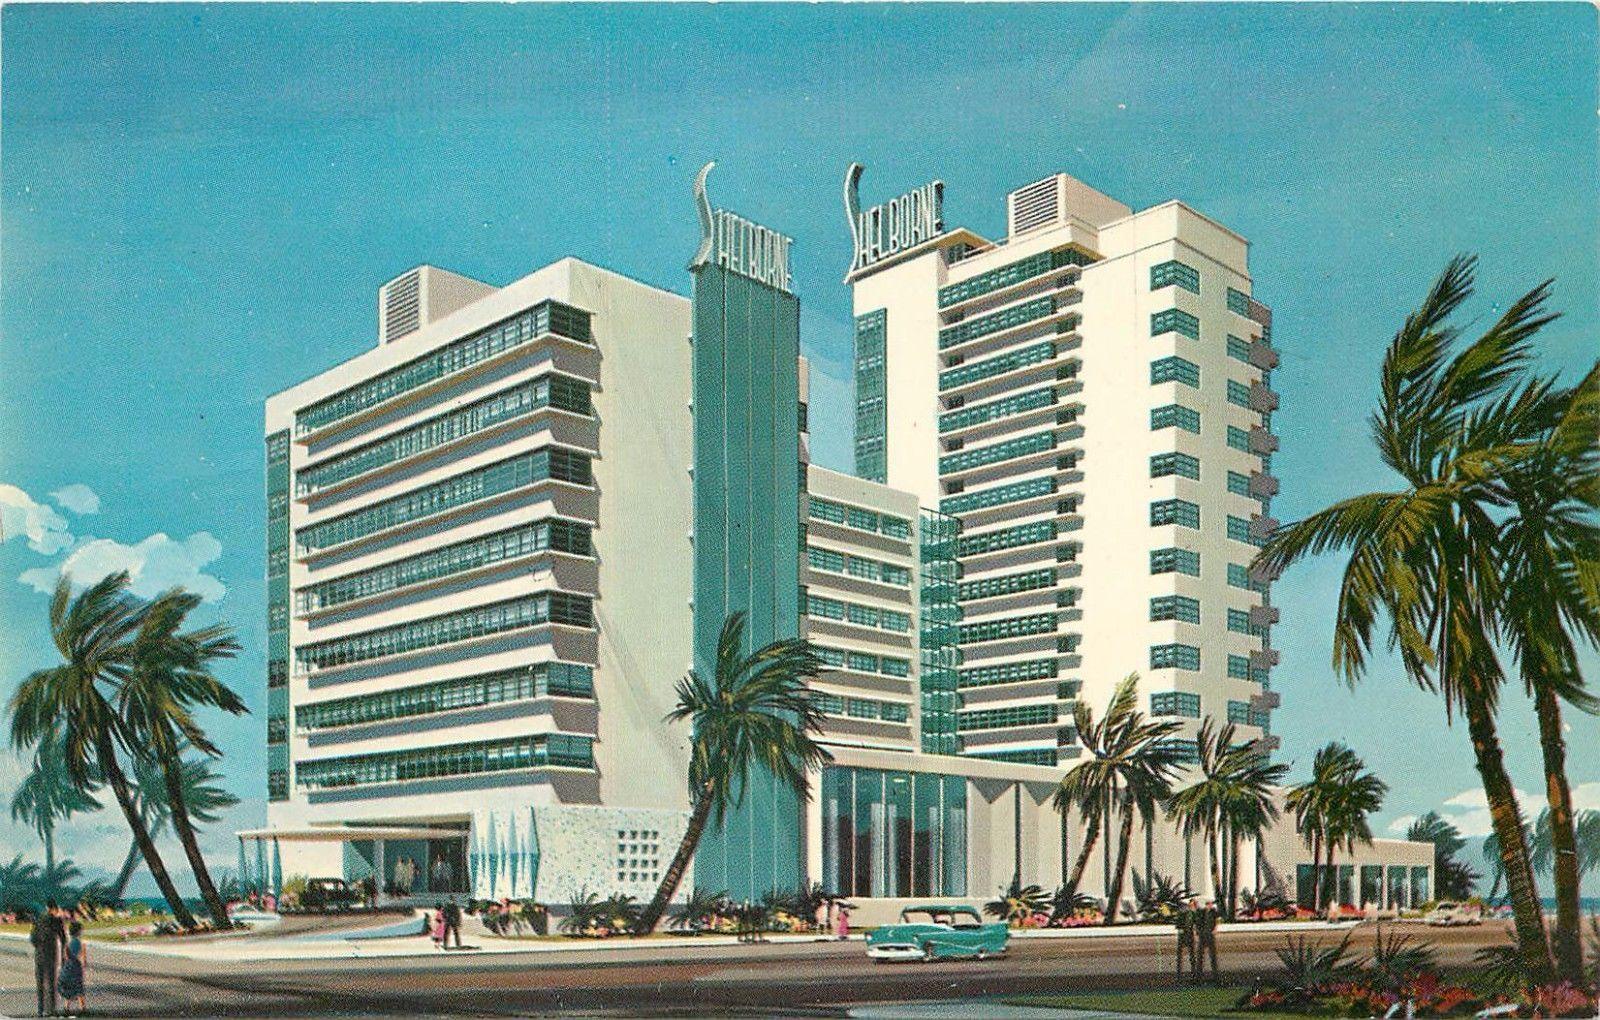 Shelbourne Hotel Cabana Club Miami Beach Florida old cars